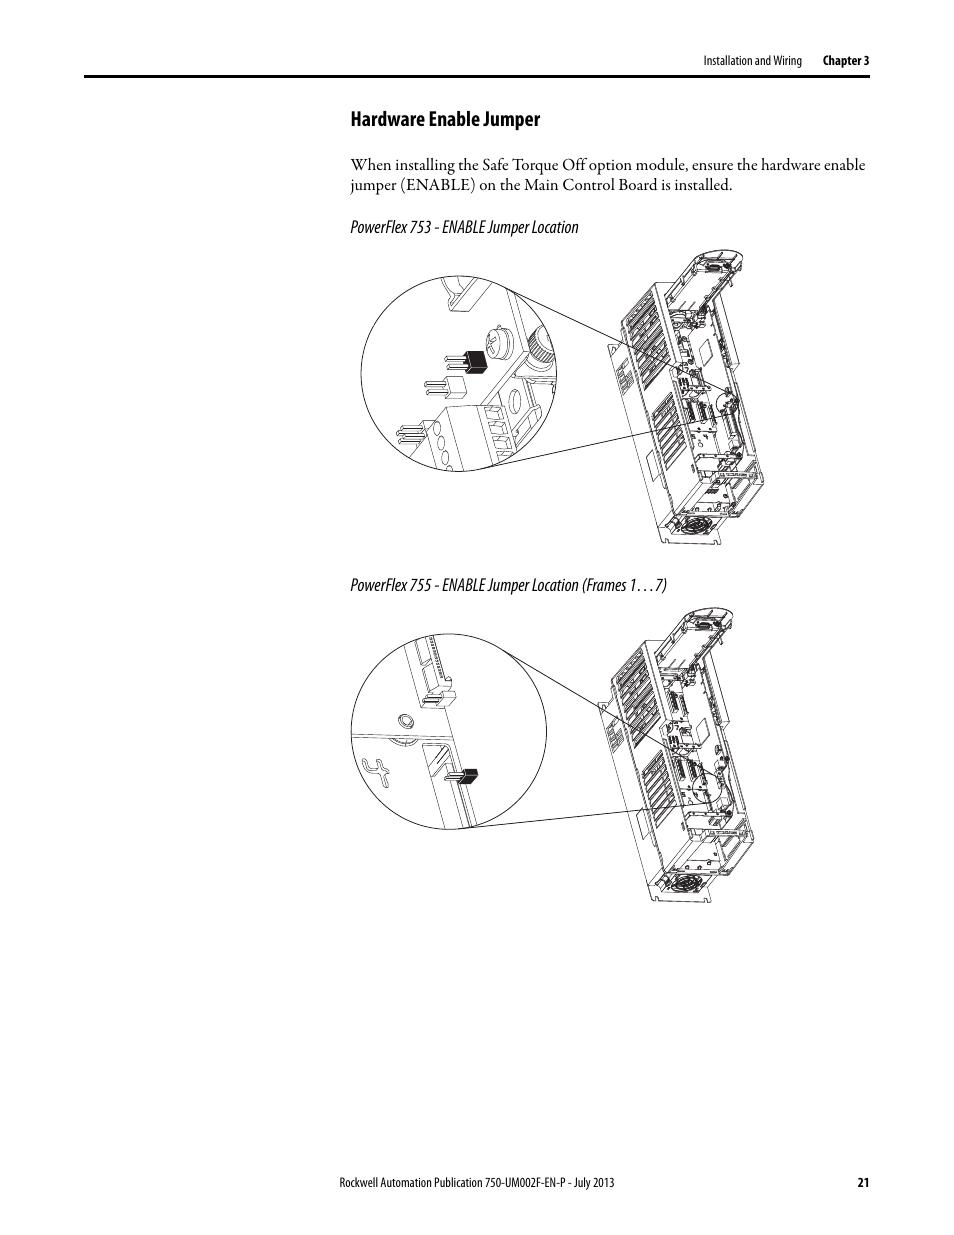 powerflex 753 wiring diagram safety powerflex 753 wiring diagram rh  maerkang org allen bradley powerflex 755 wiring diagram PowerFlex 755 Fault  Codes